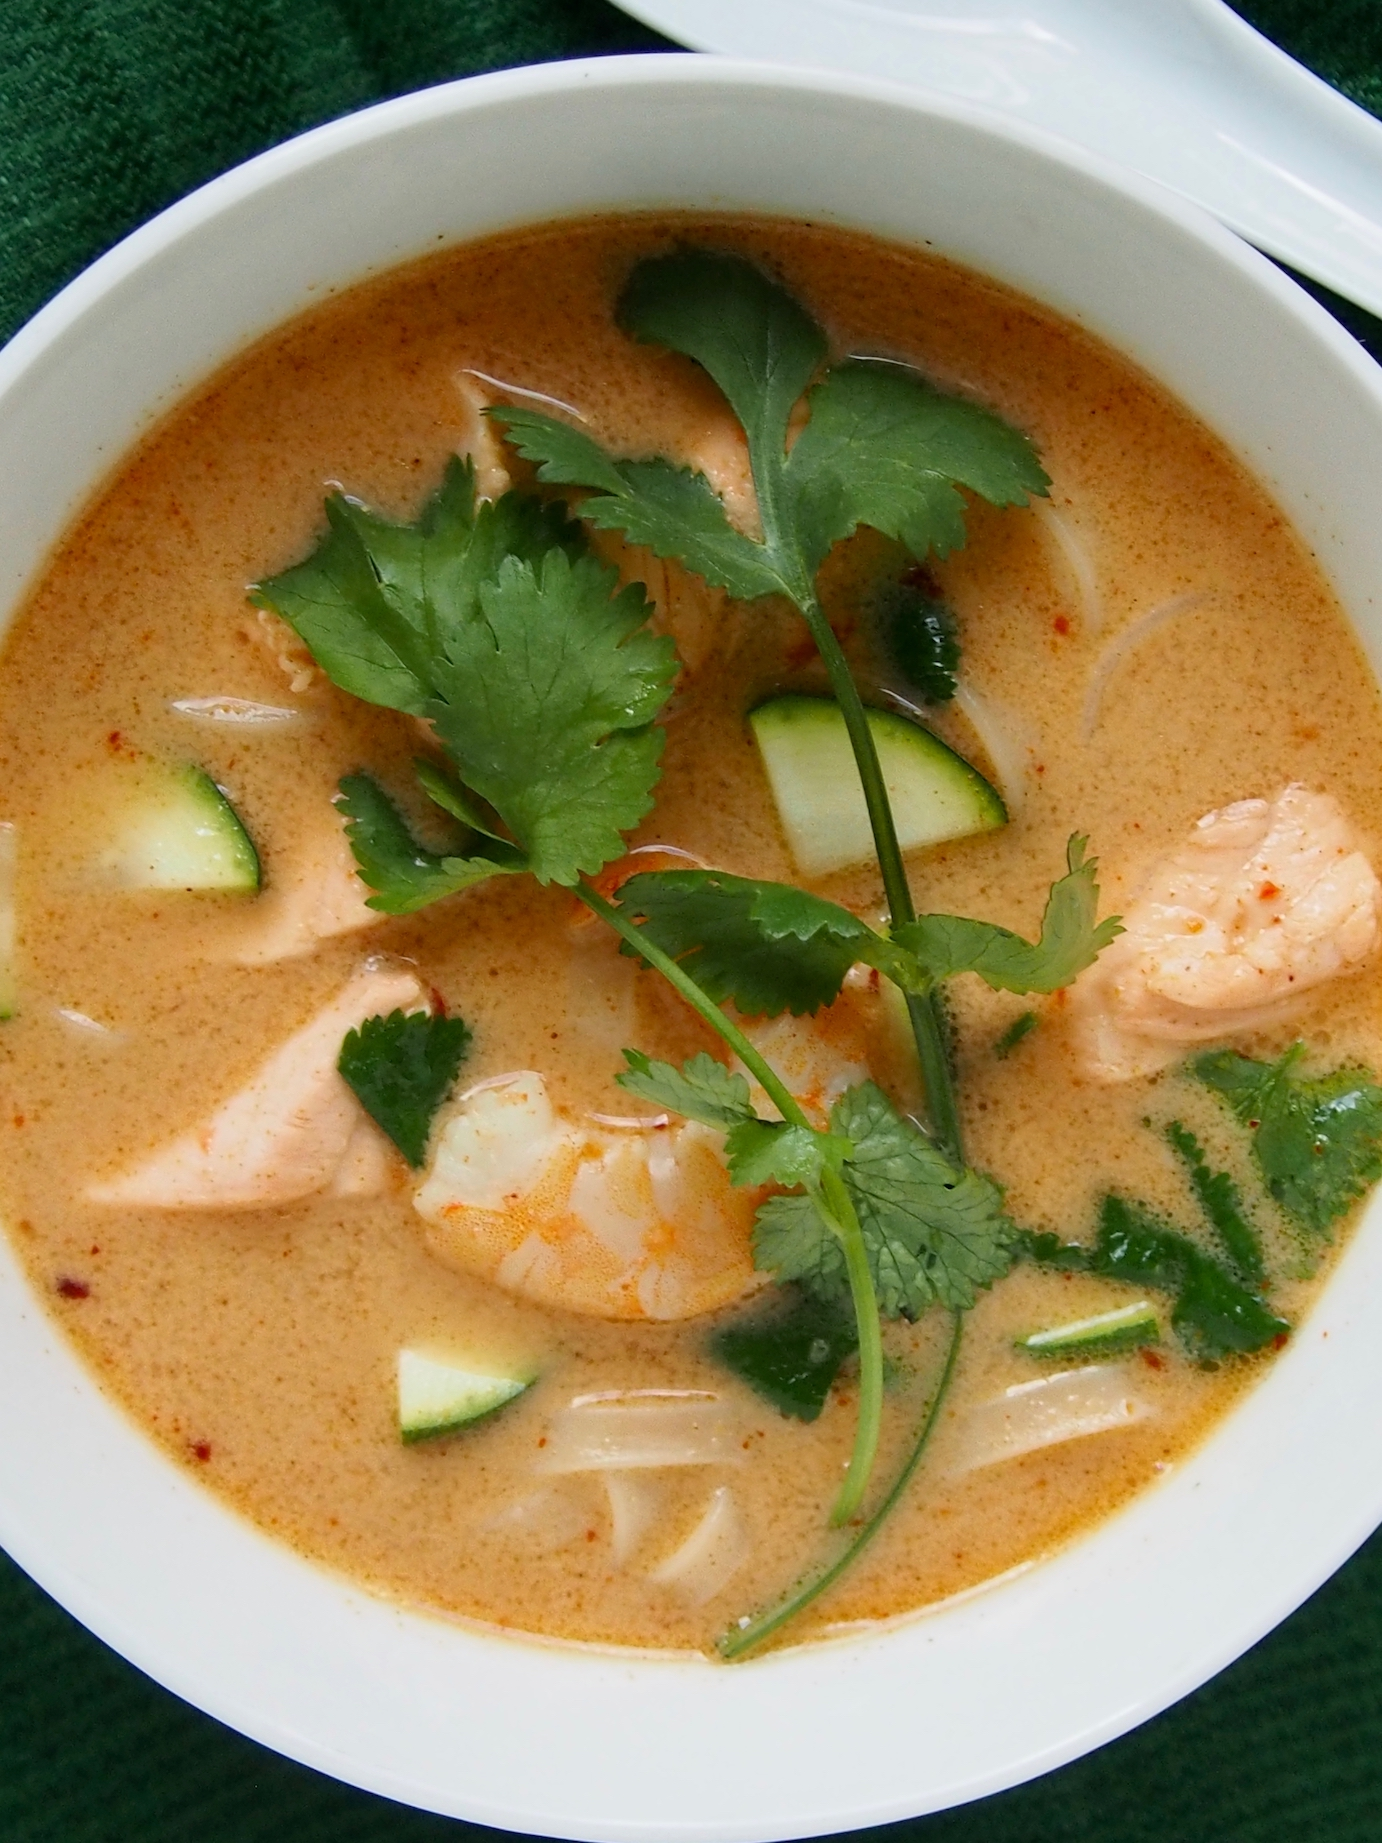 sriuba su lašiša